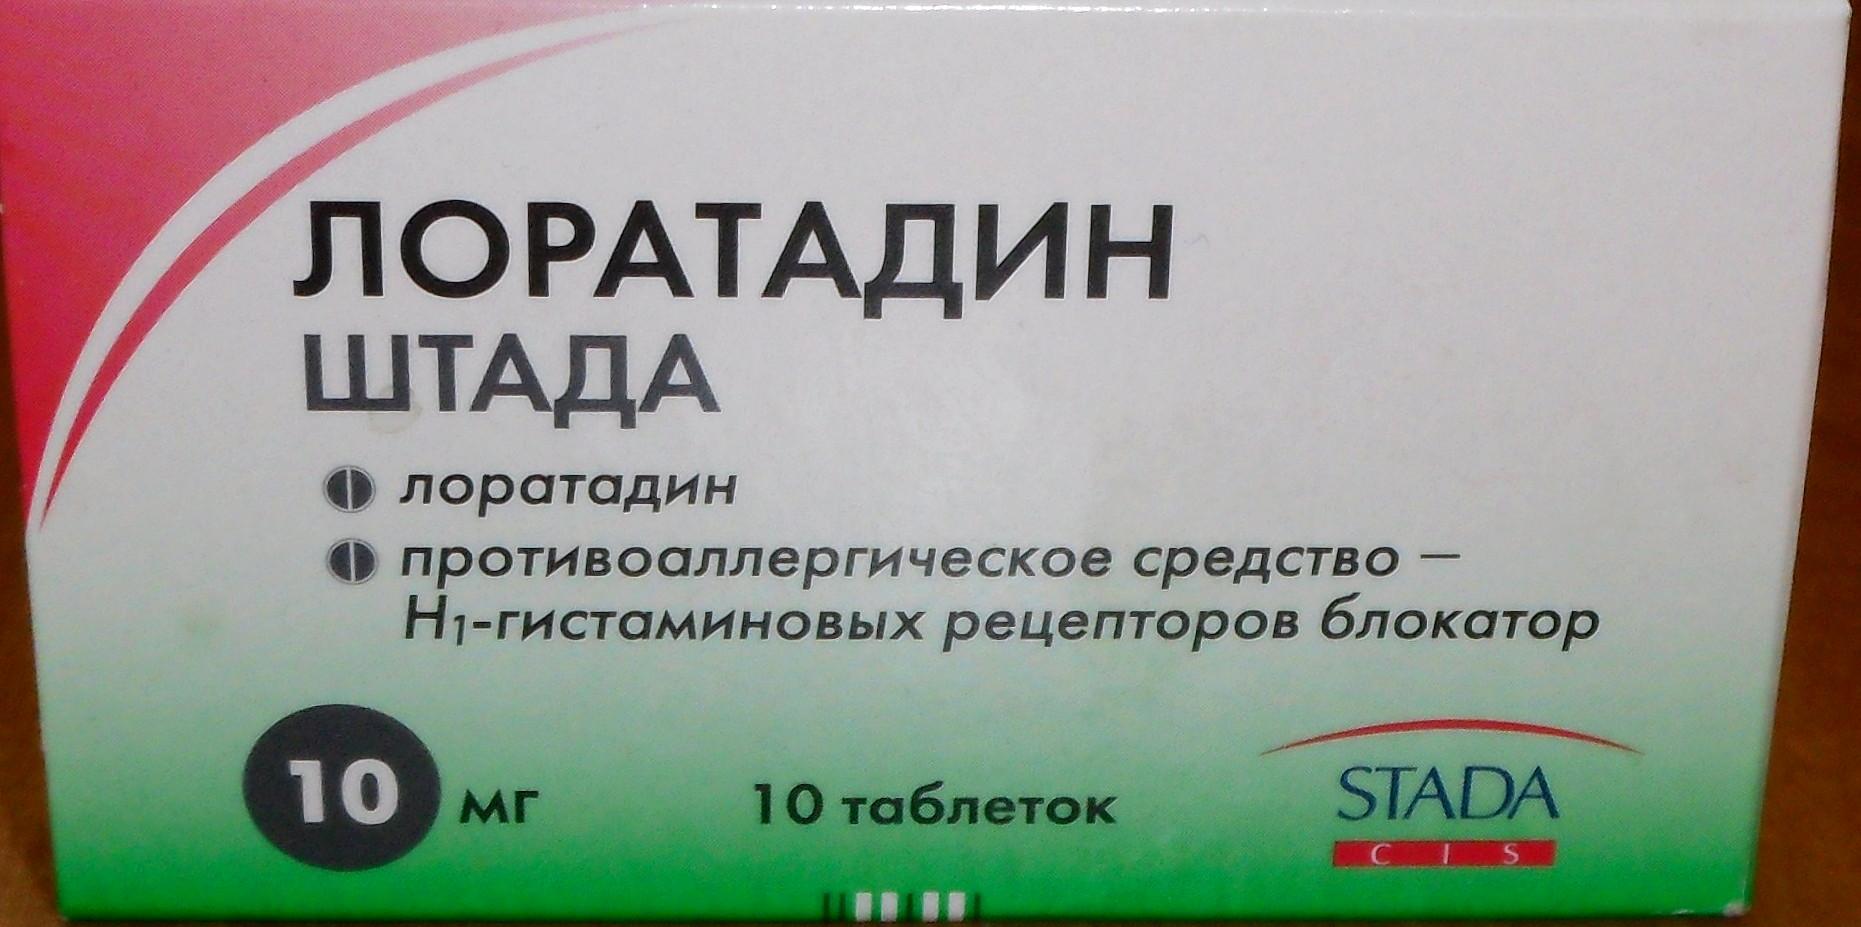 Таблетки от аллергии Лоратадин - инструкция по применению препарата